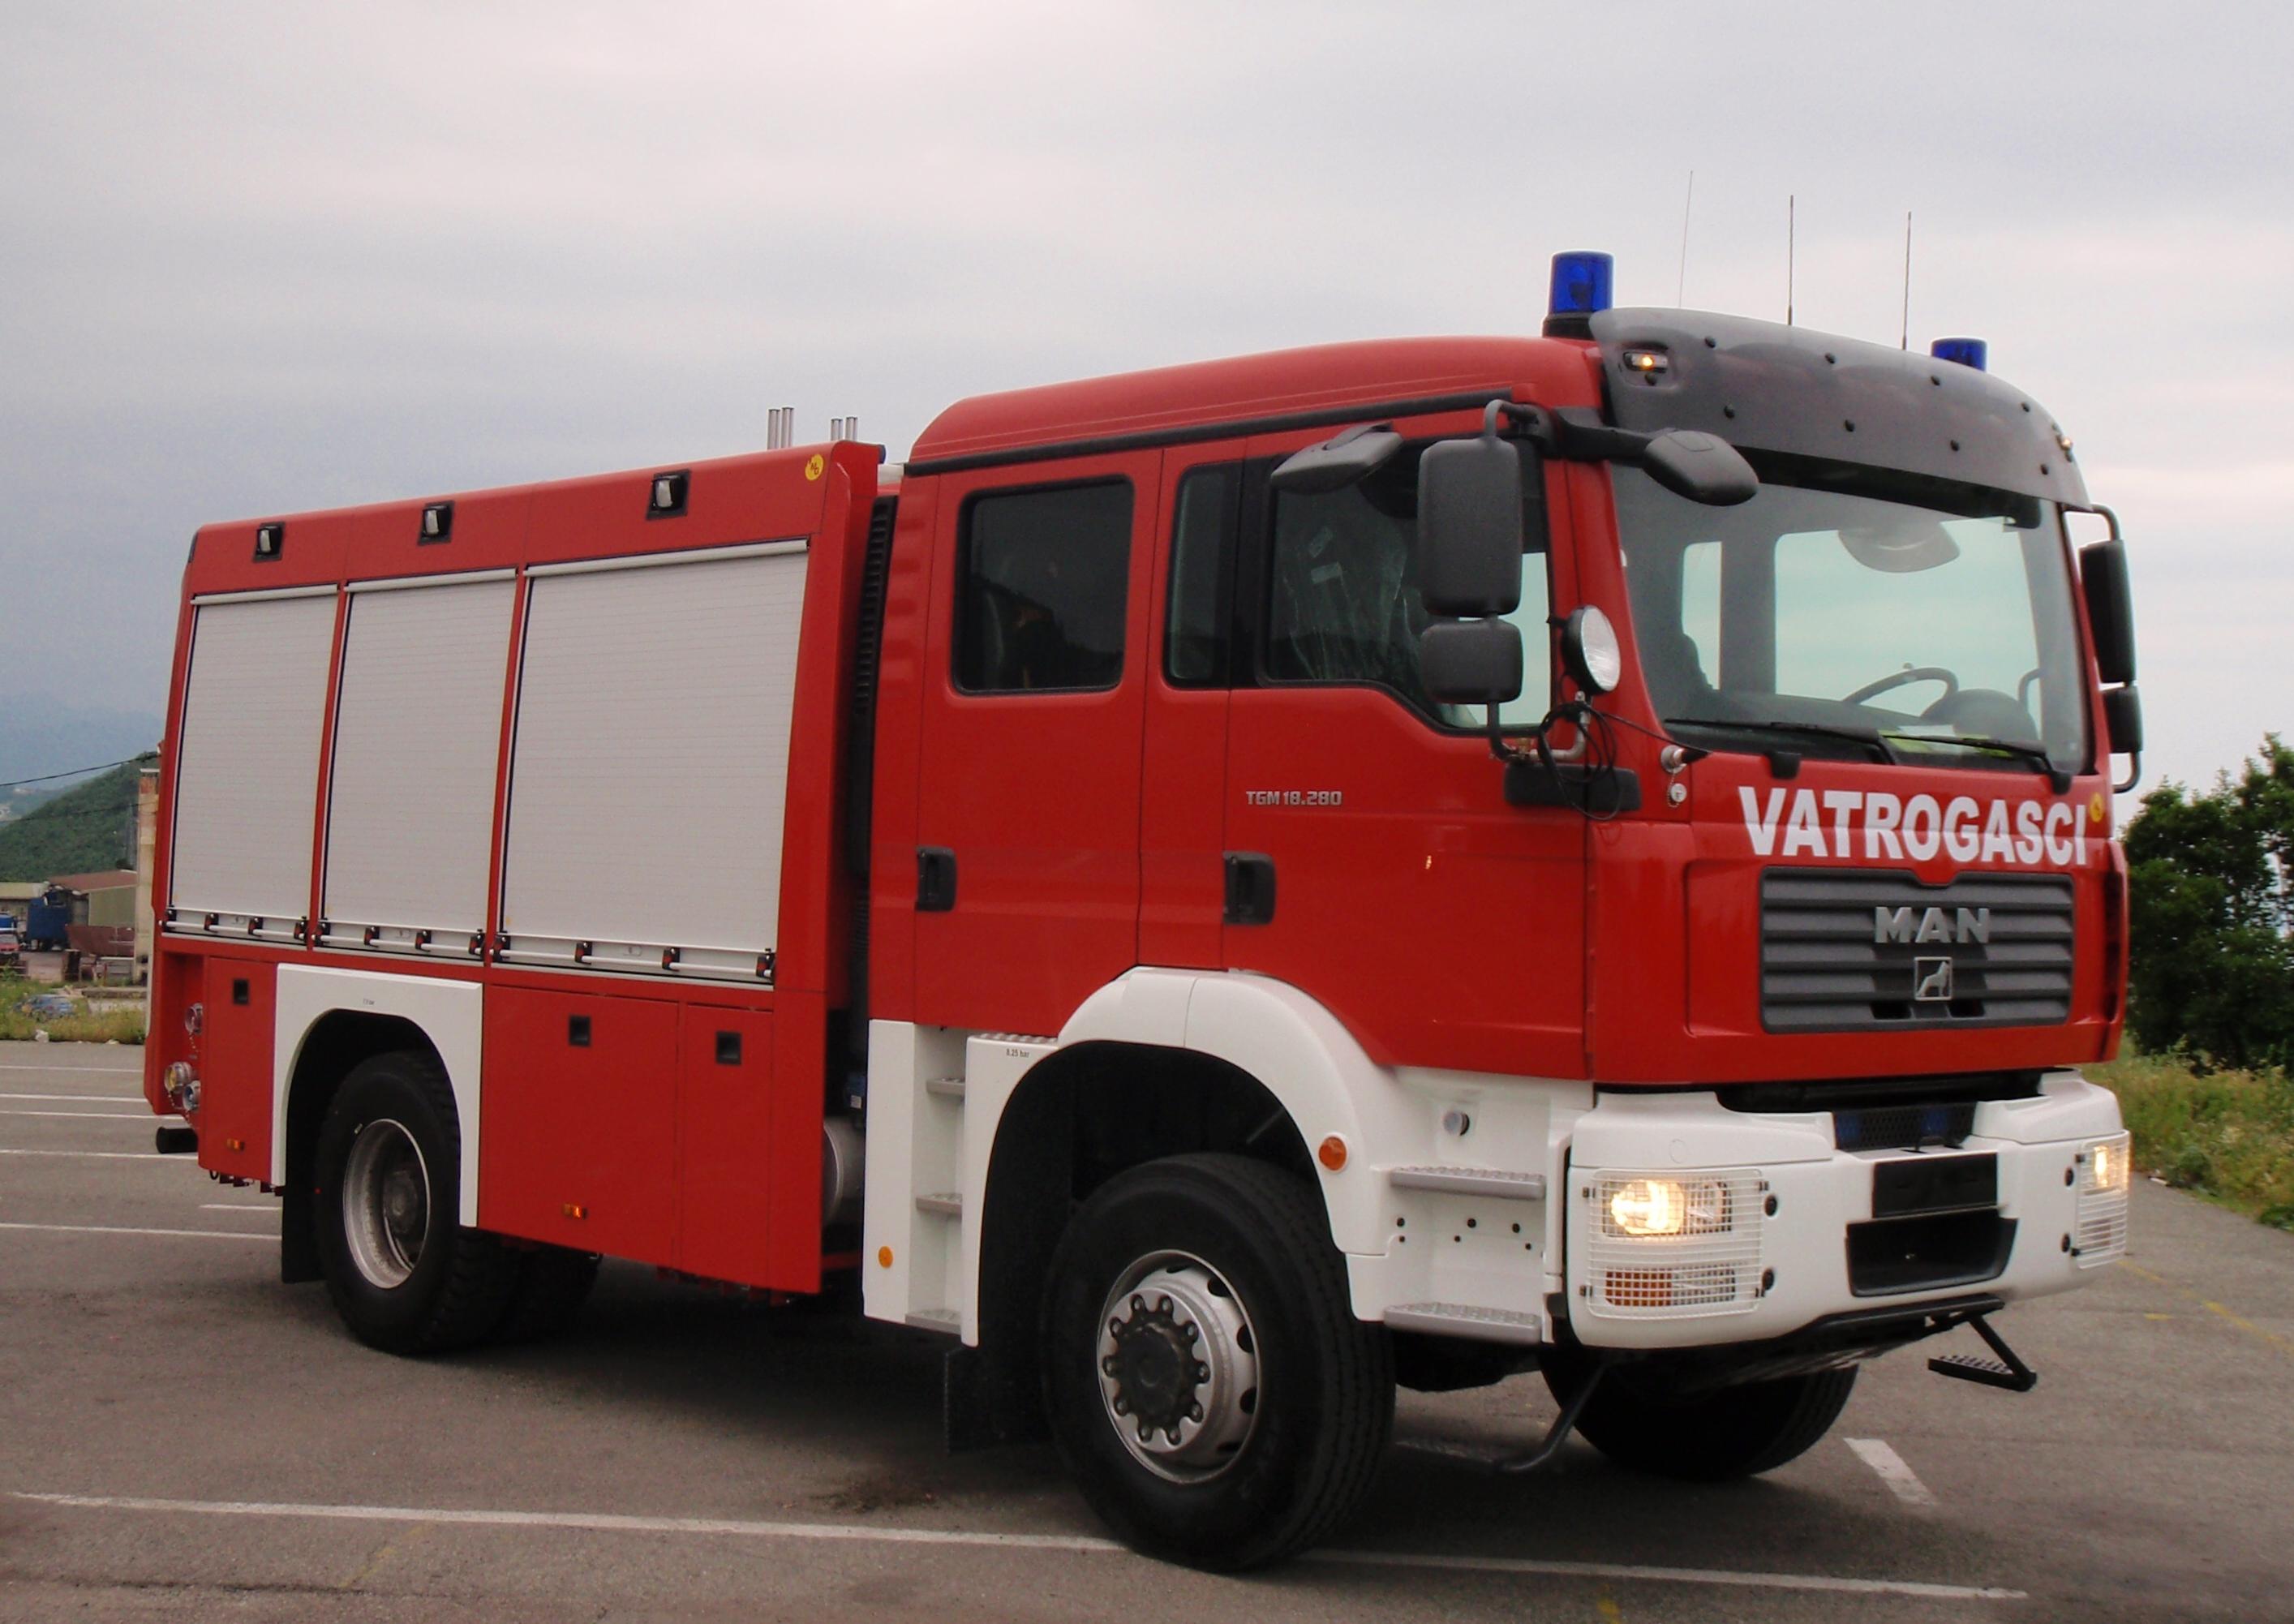 Pet intervencija kakanjskih vatrogasaca u protekla 24 sata